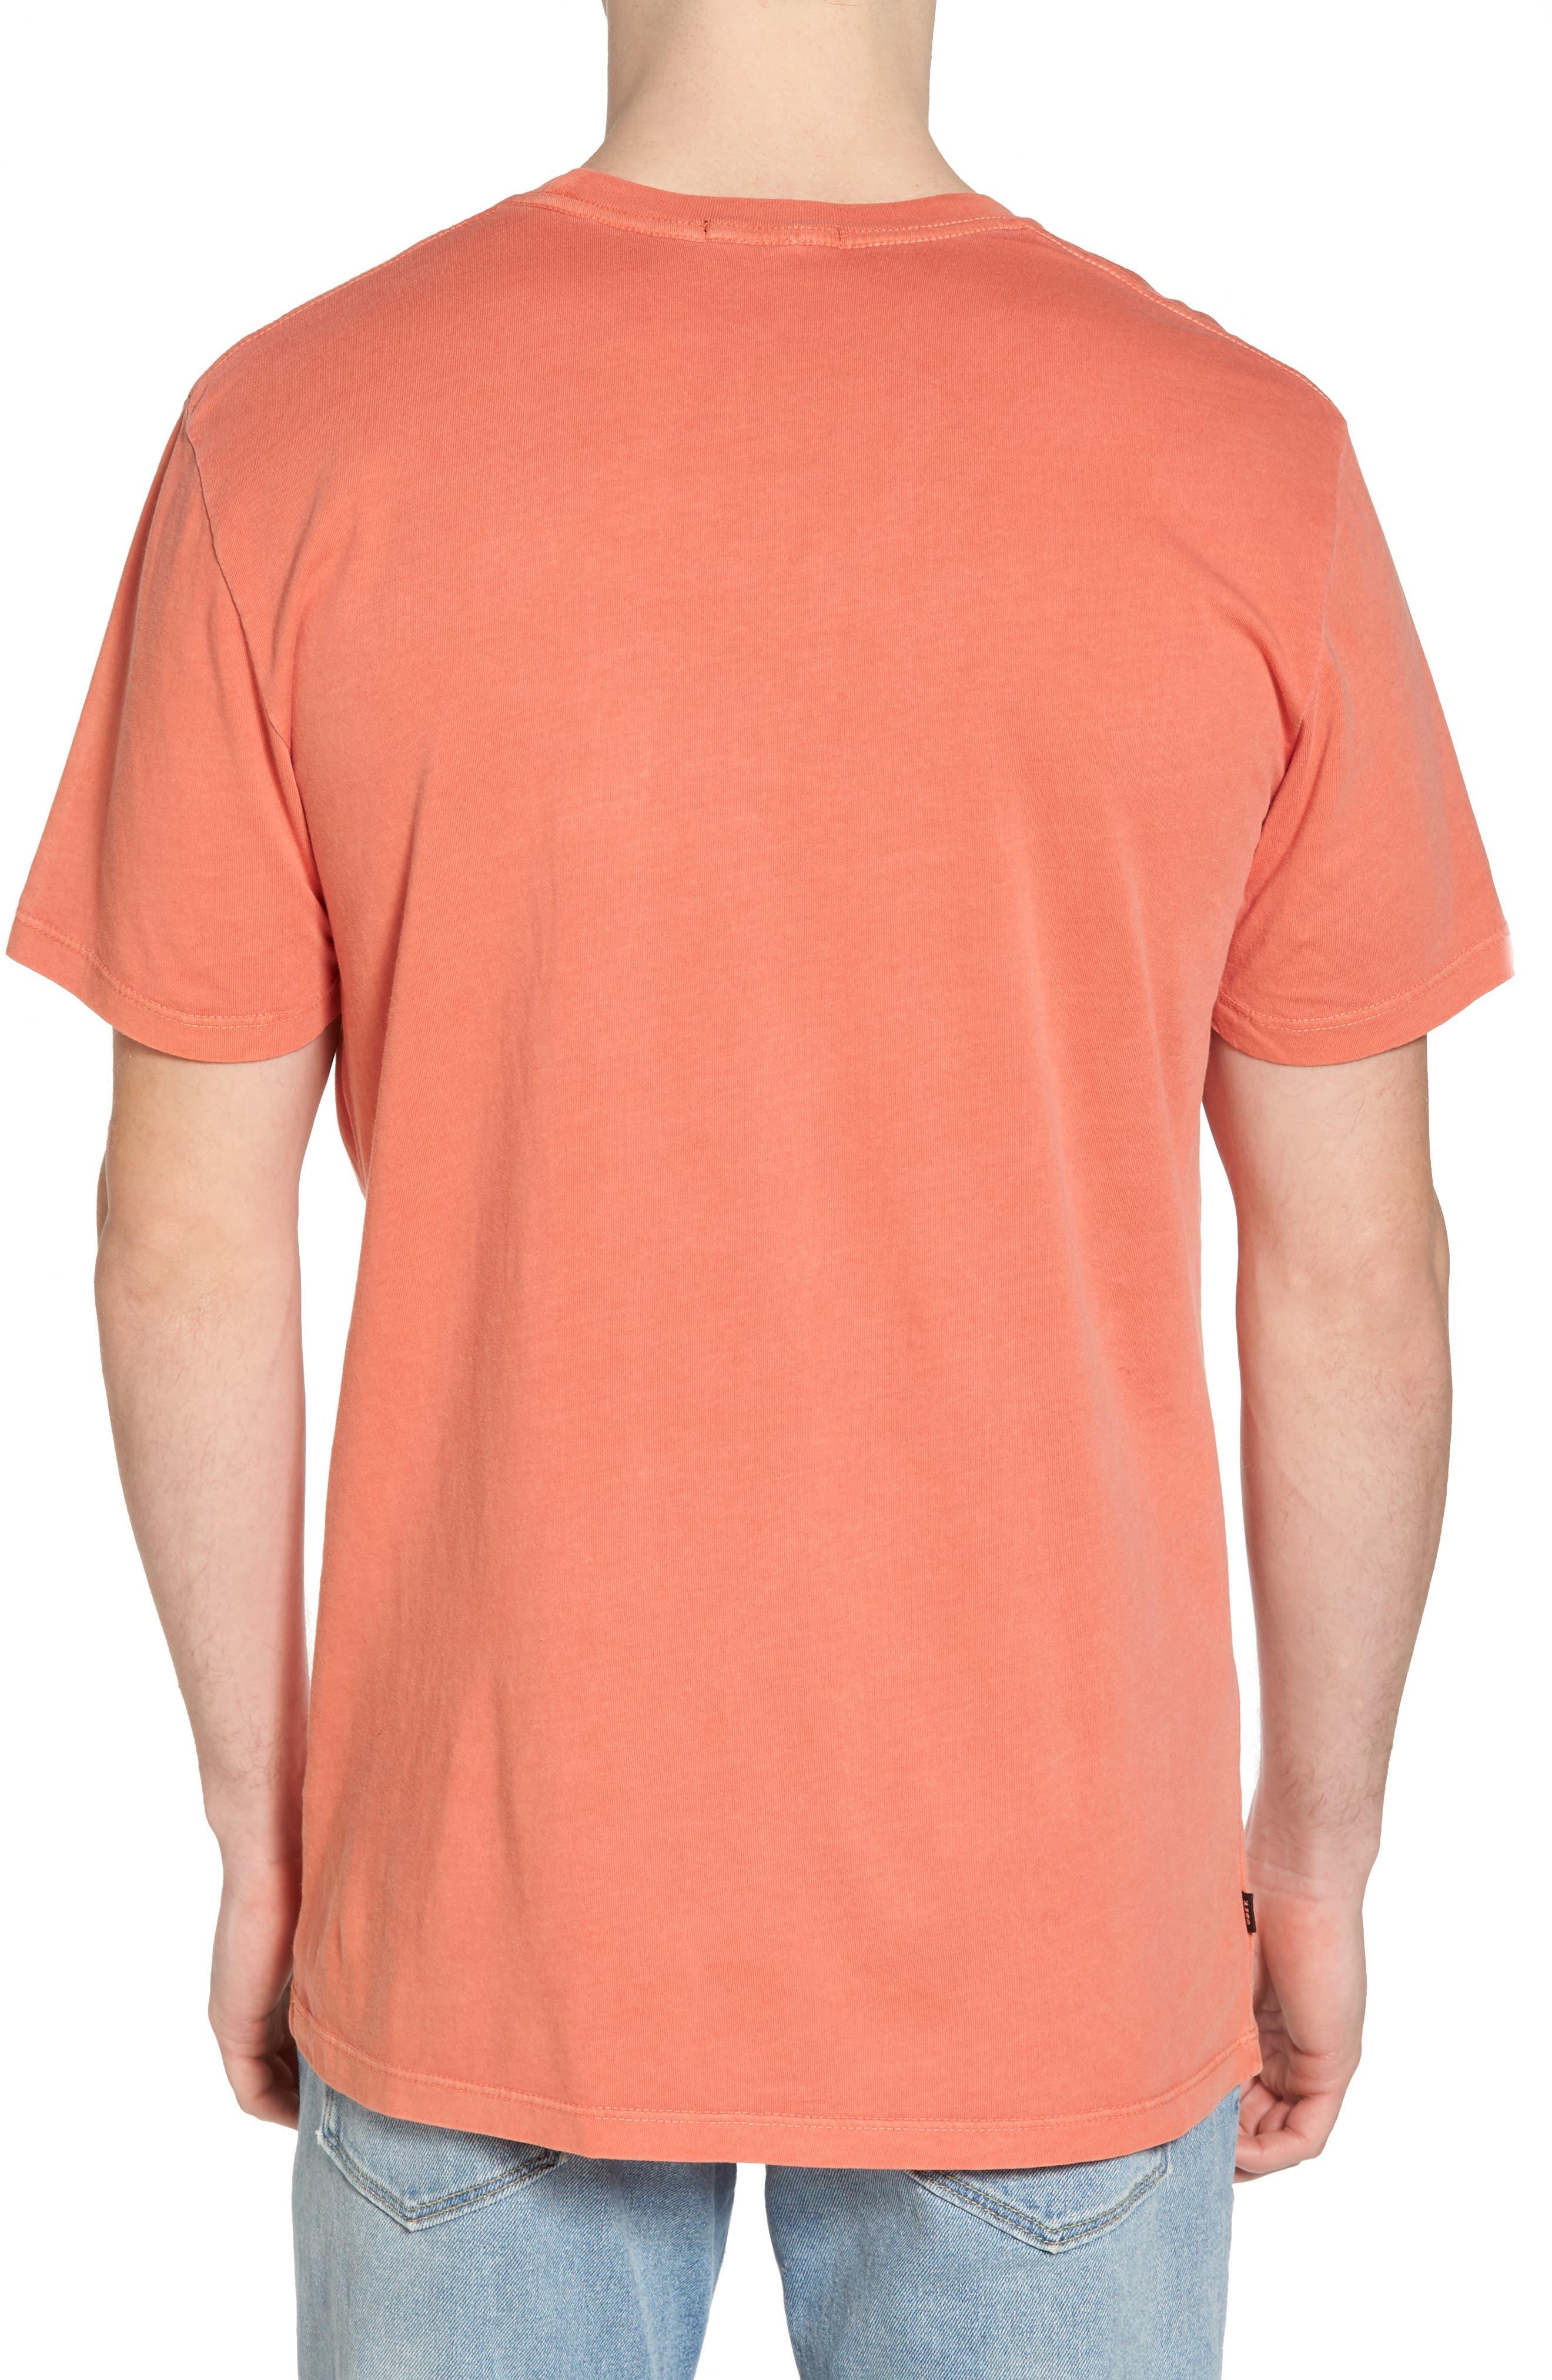 Dominance Graphic T-Shirt,                             Alternate thumbnail 2, color,                             800